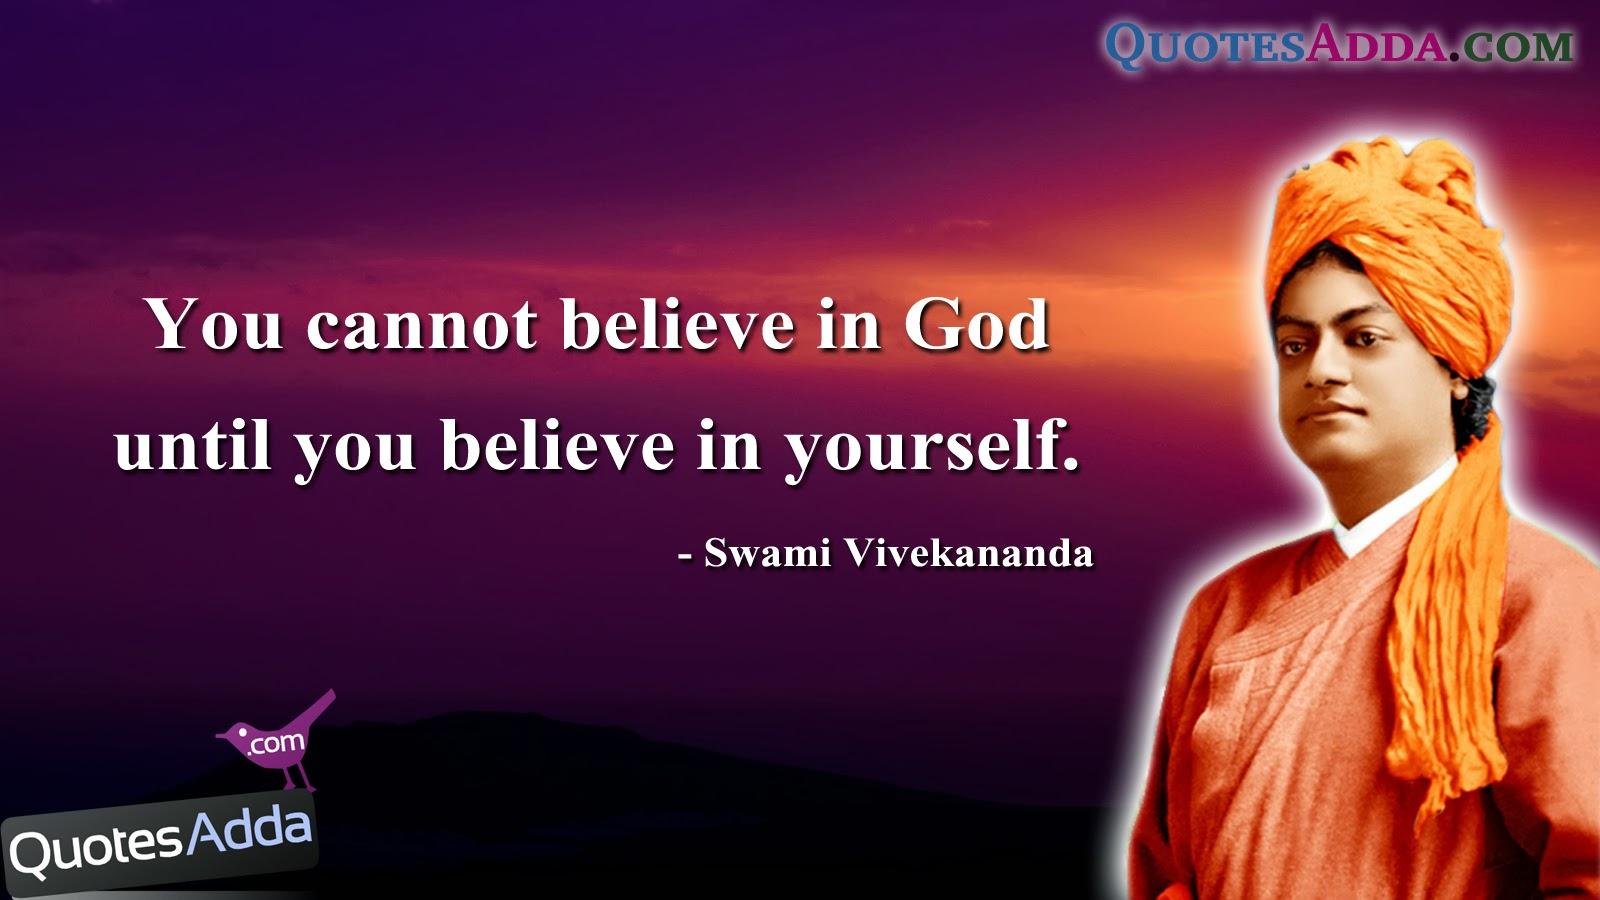 vivekananda quotes on god in tamil quotesgram vivekananda quotes on god in tamil